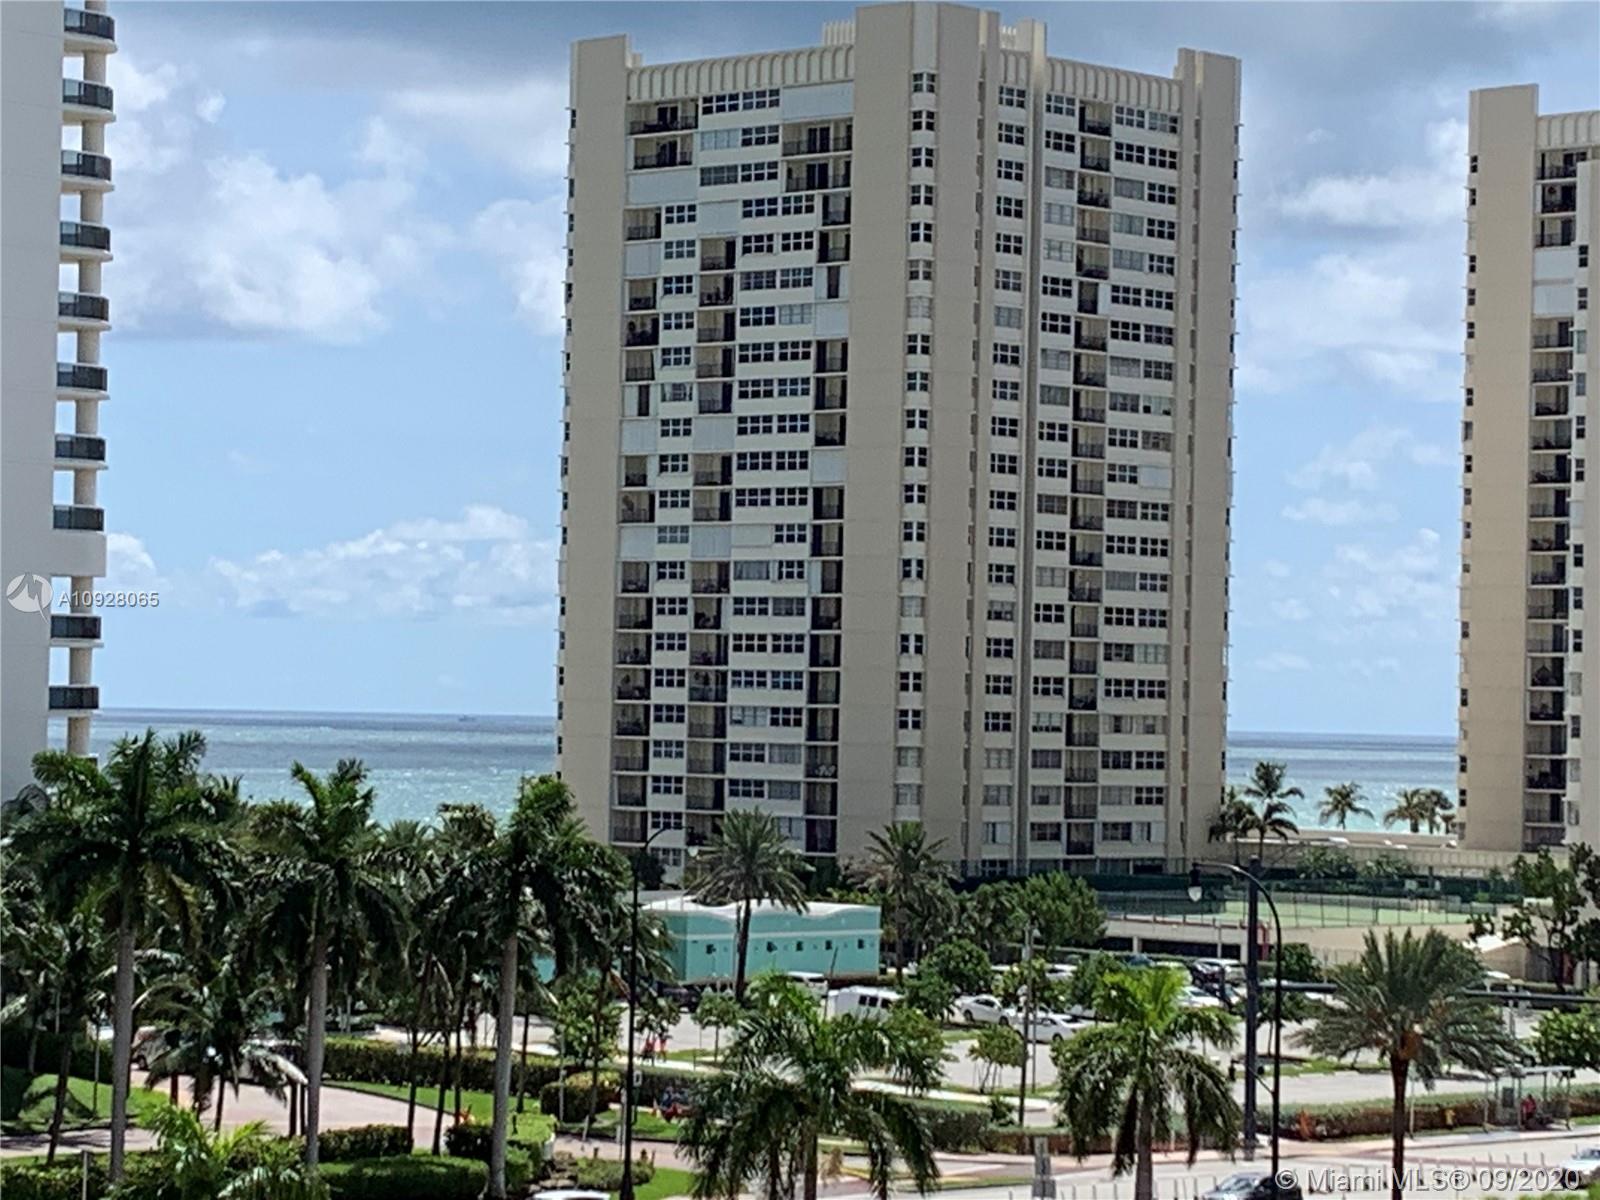 Imperial Towers Three #609 - 1825 S Ocean Dr #609, Hallandale Beach, FL 33009